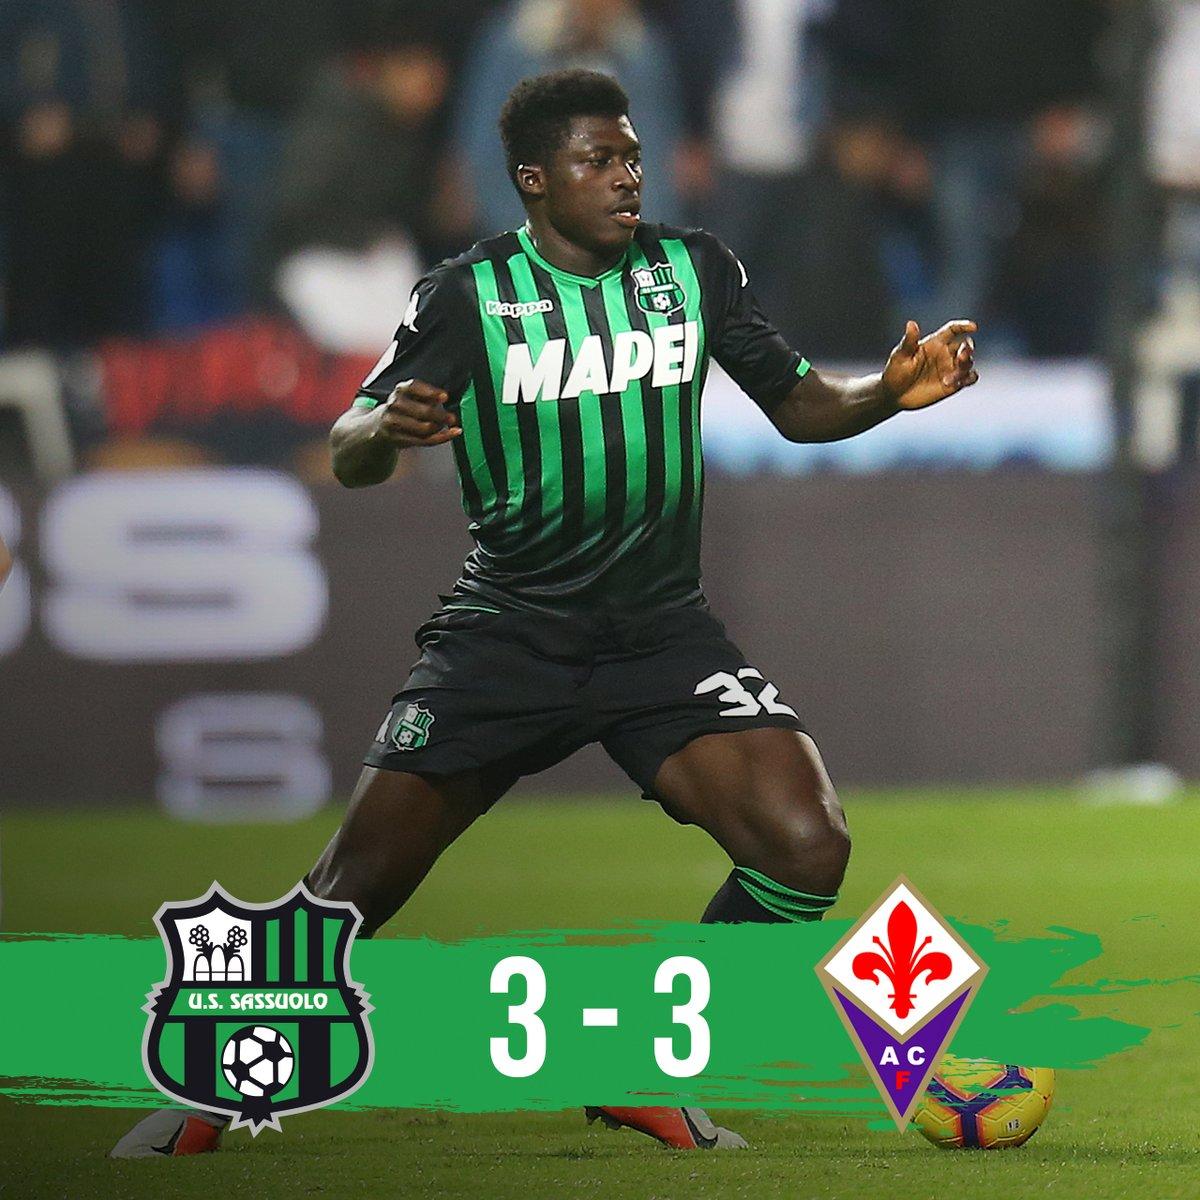 Pazza sfida tra Sassuolo e Fiorentina: al Mapei Stadium finisce 3-3!!!